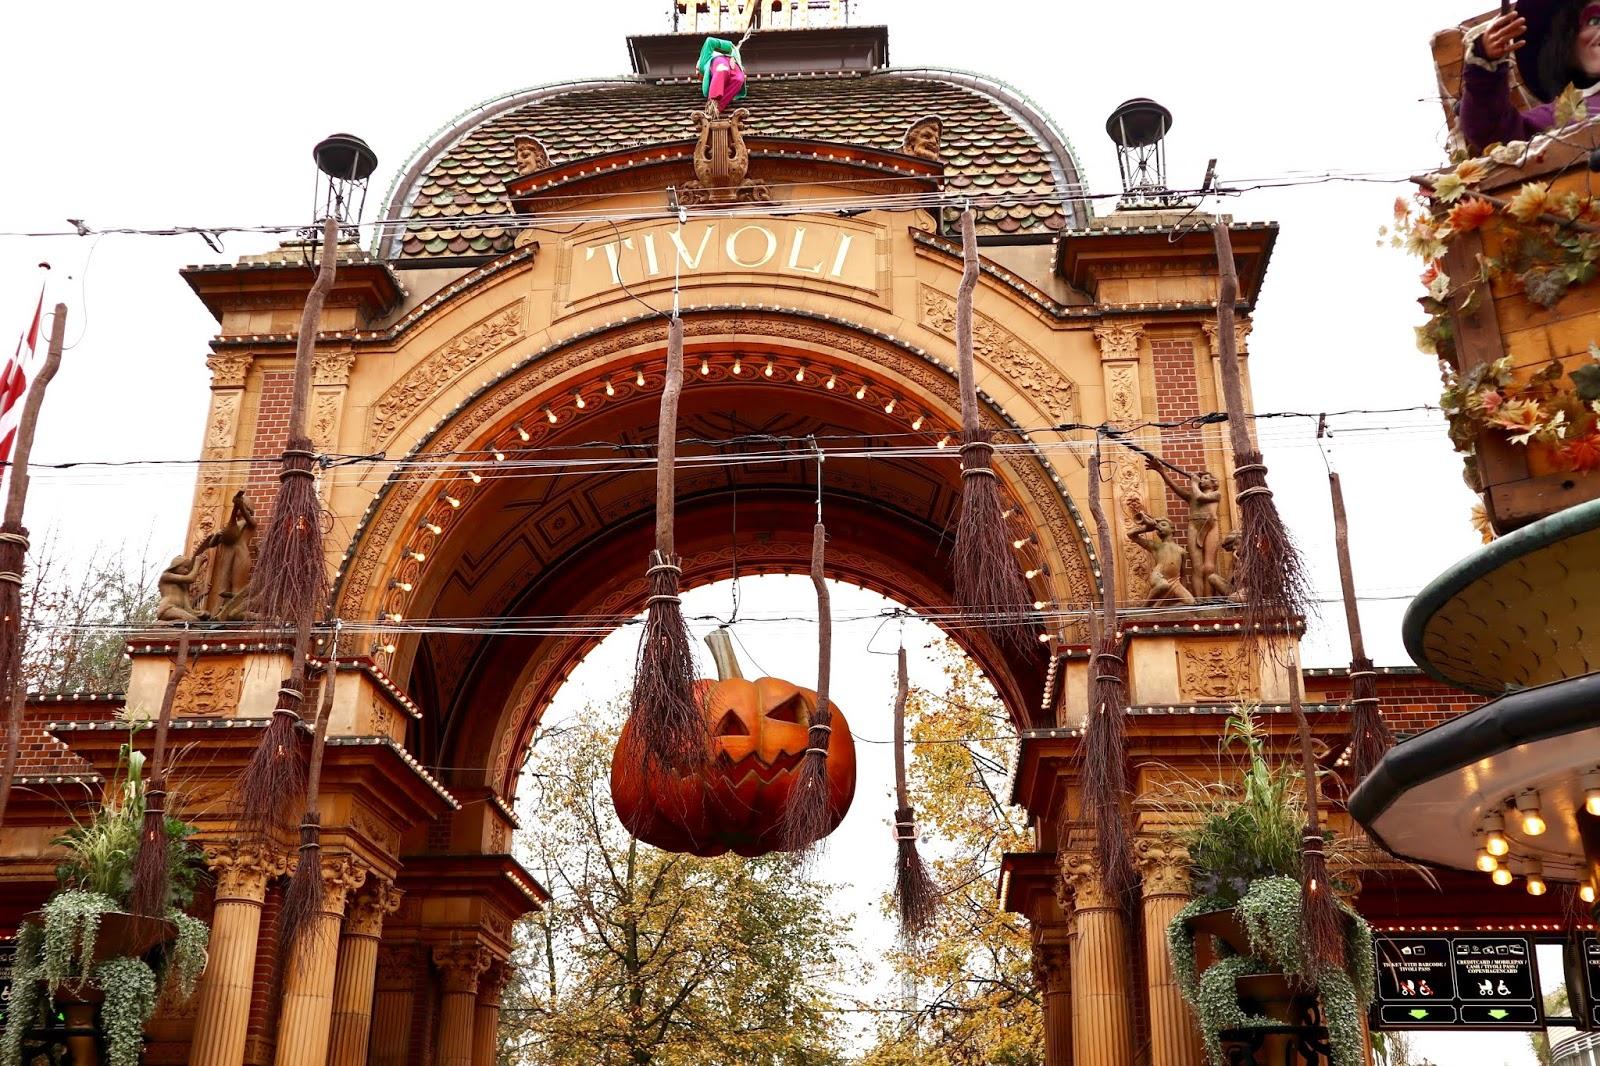 Visit Tivoli Gardens at Halloween time